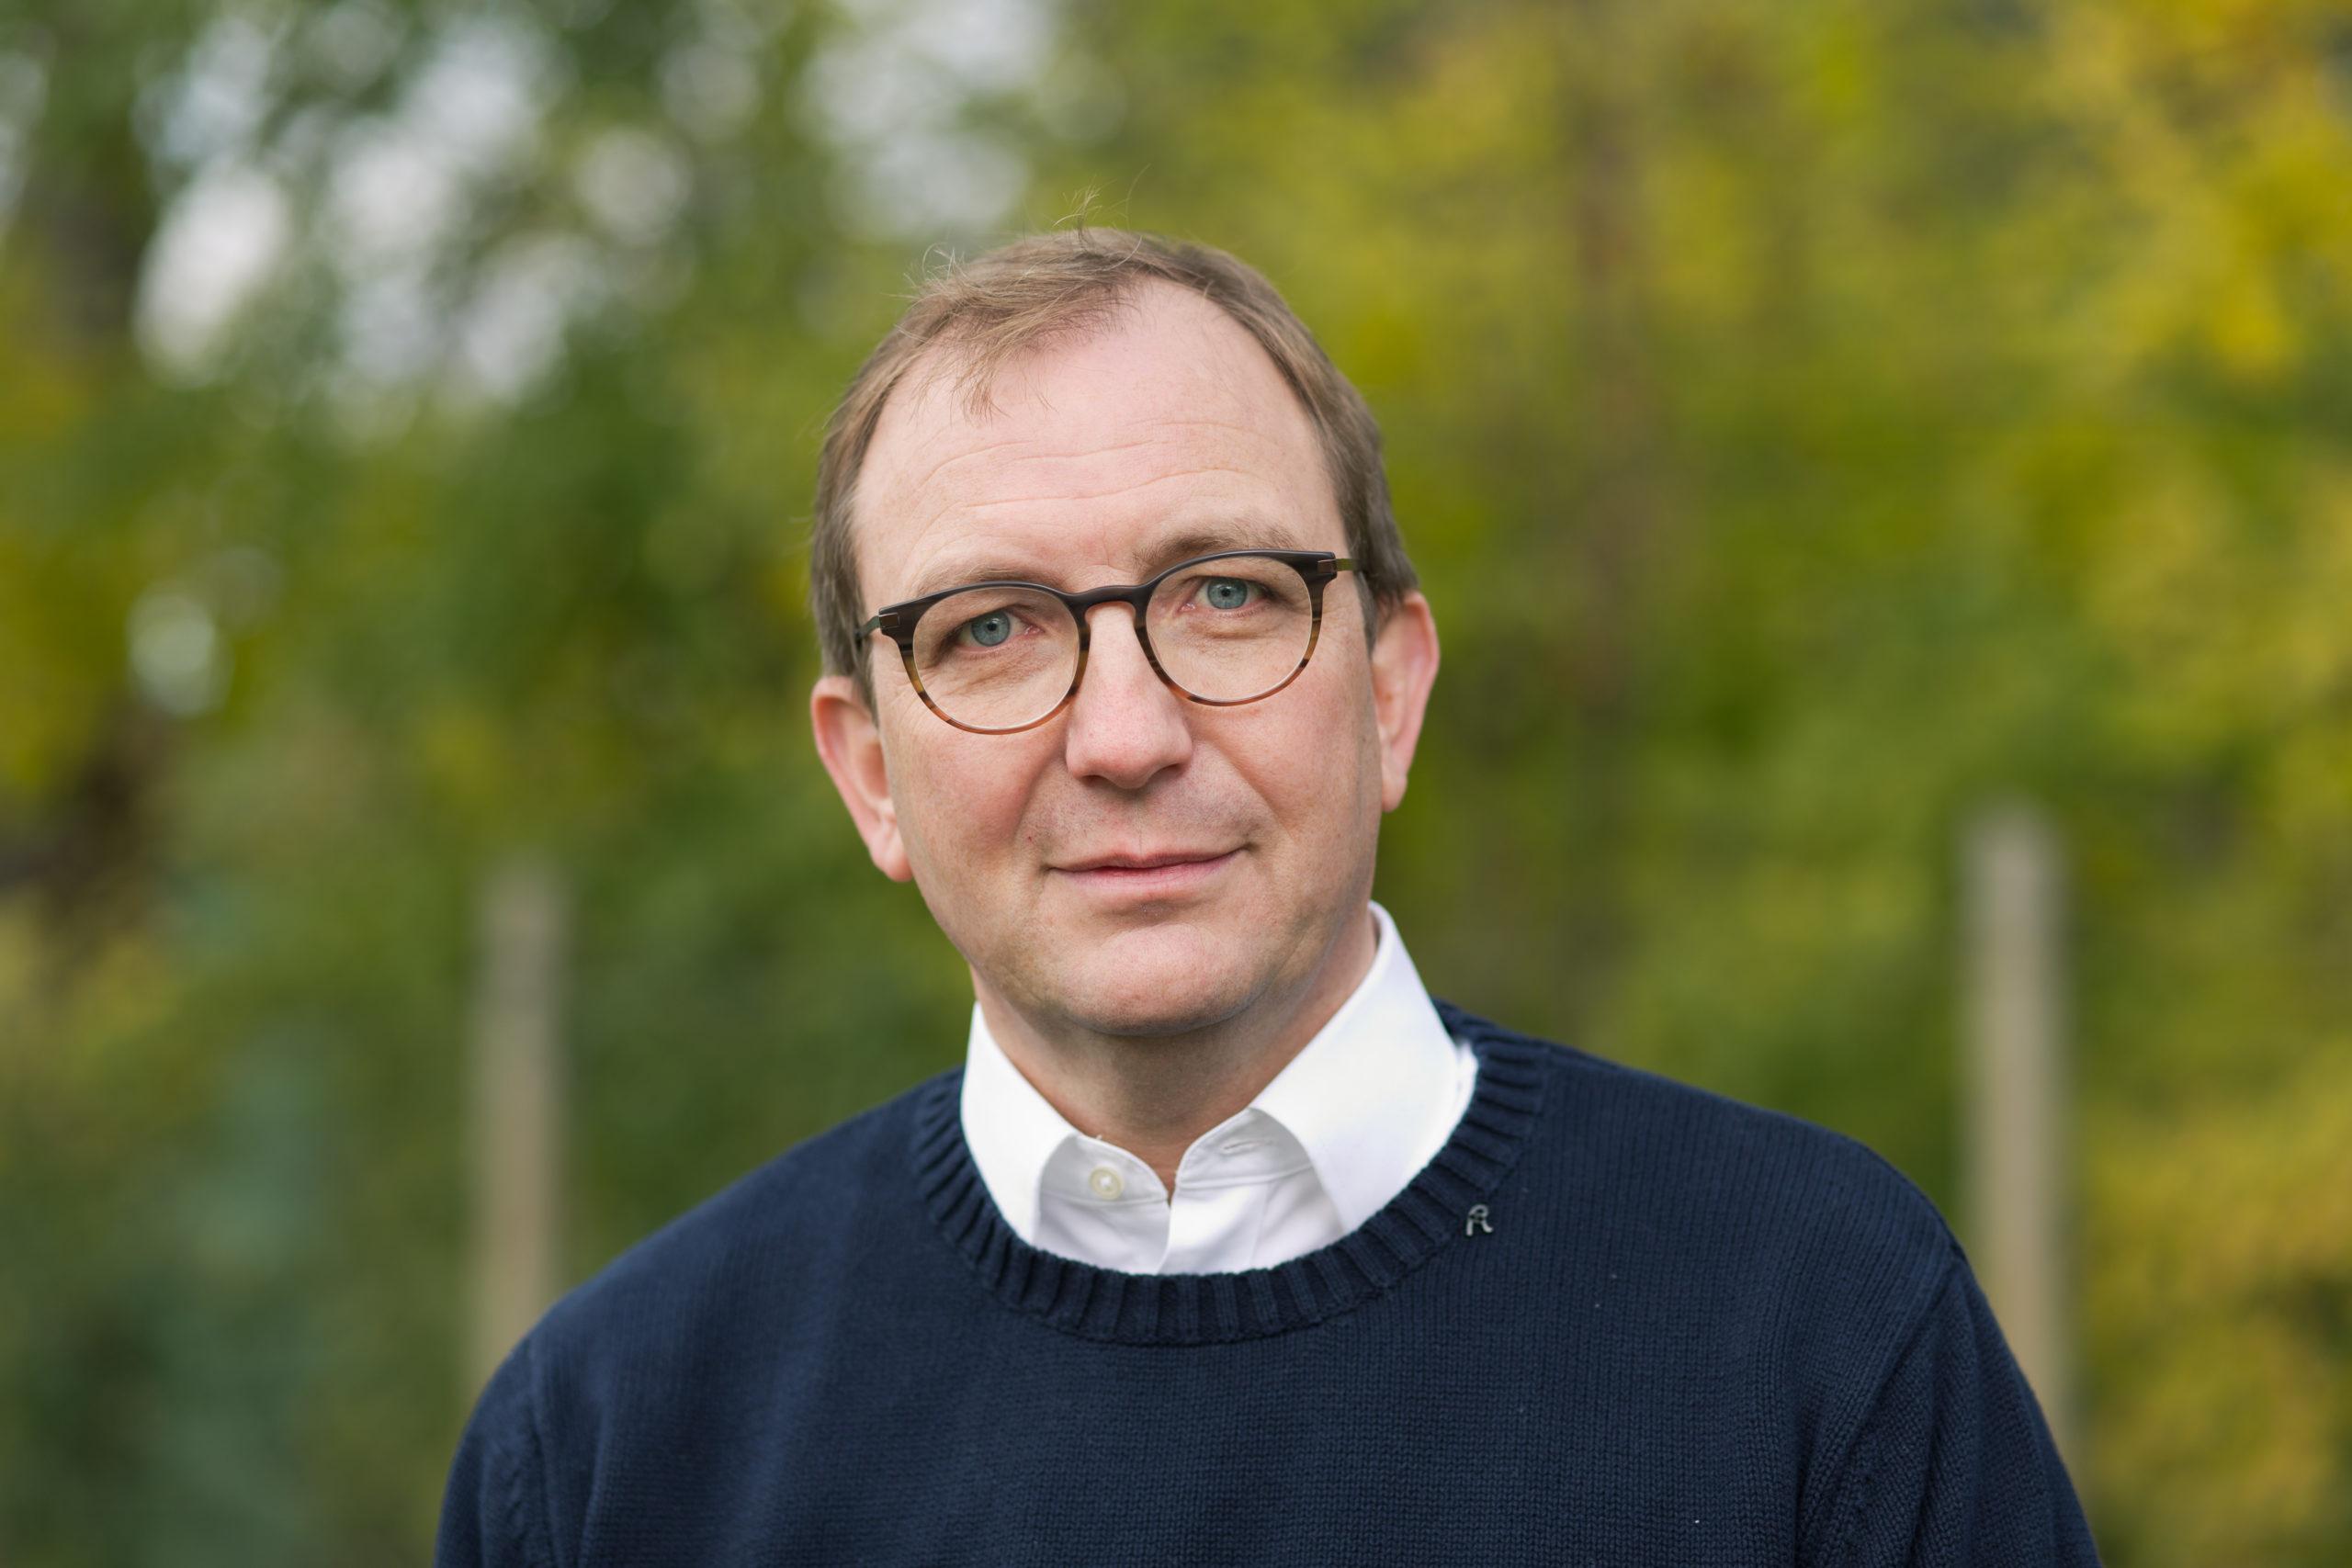 Landrat Markus Bauer